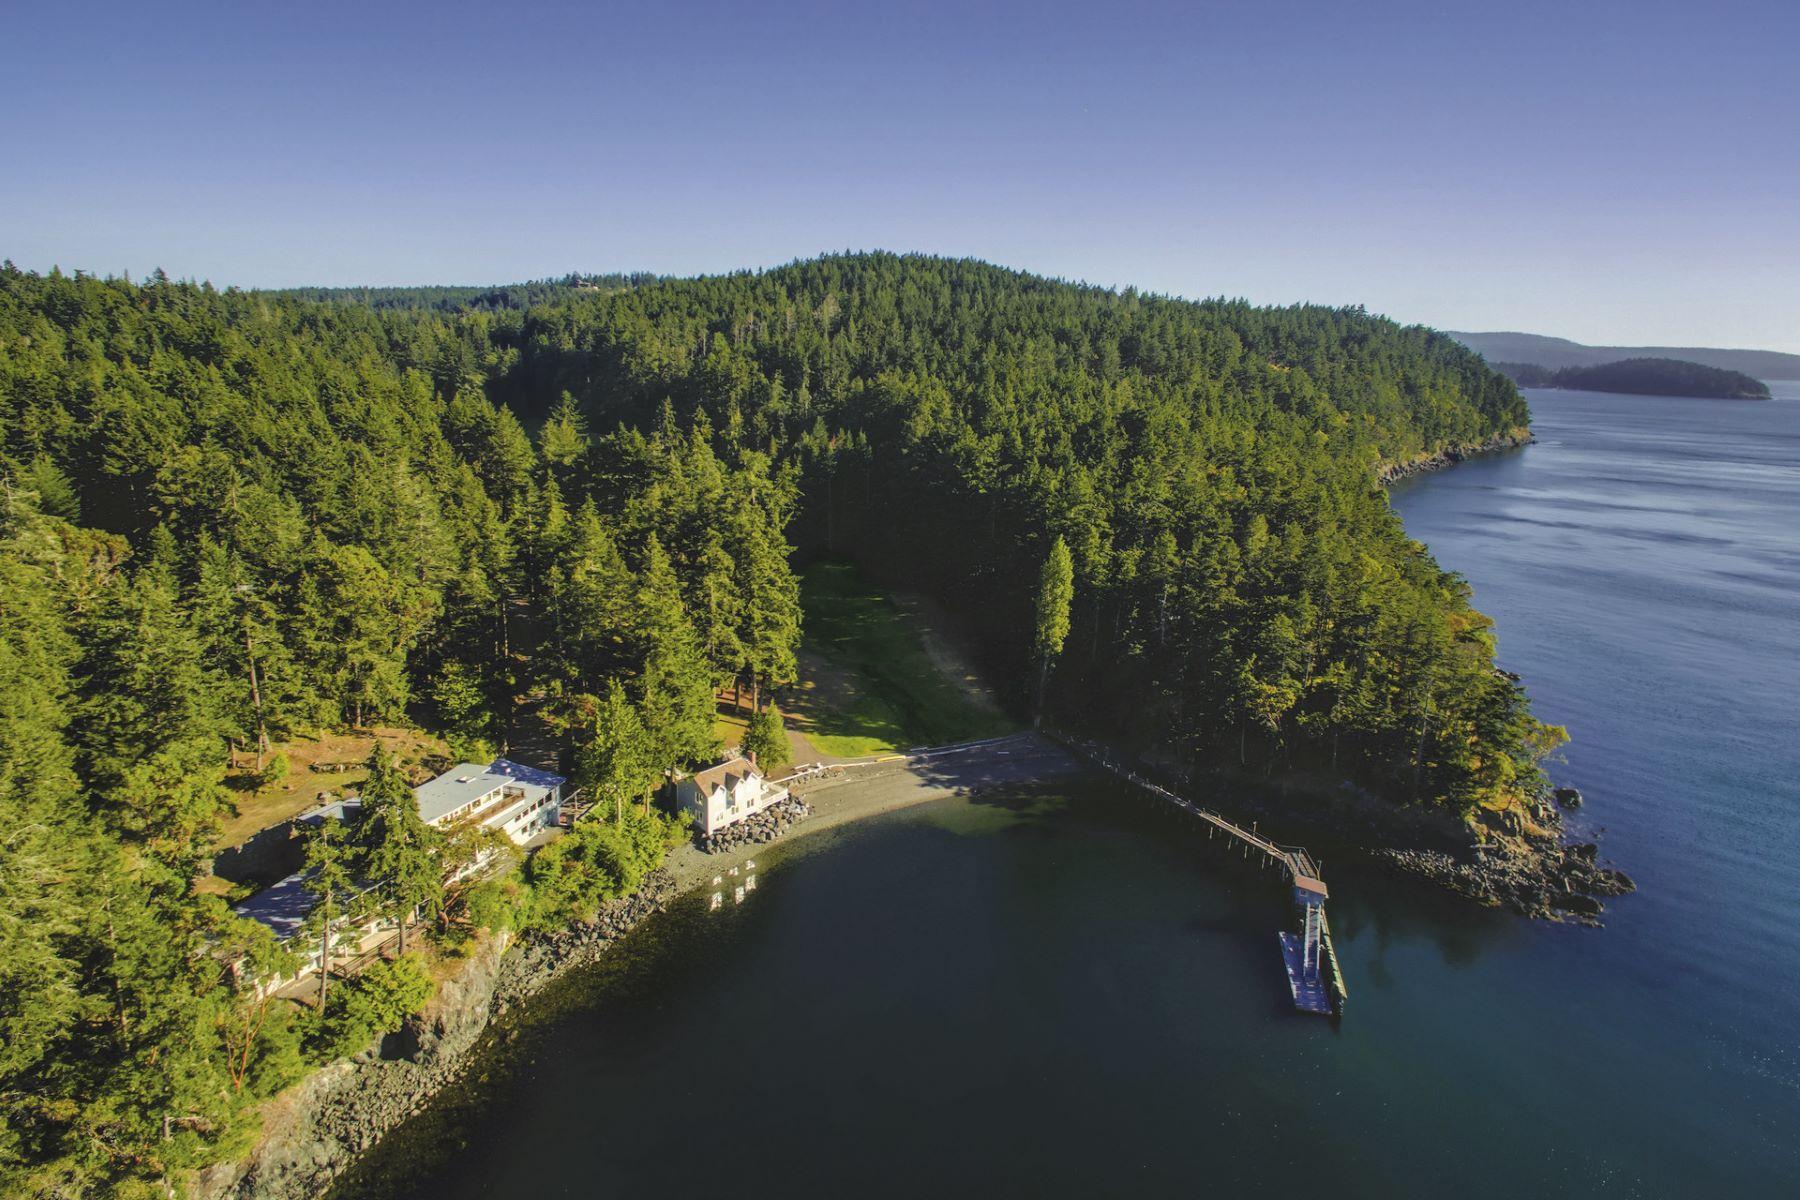 独户住宅 为 销售 在 Cormorant Bay Seascape 945 Cormorant Bay Road Orcas, 华盛顿州, 98245 美国